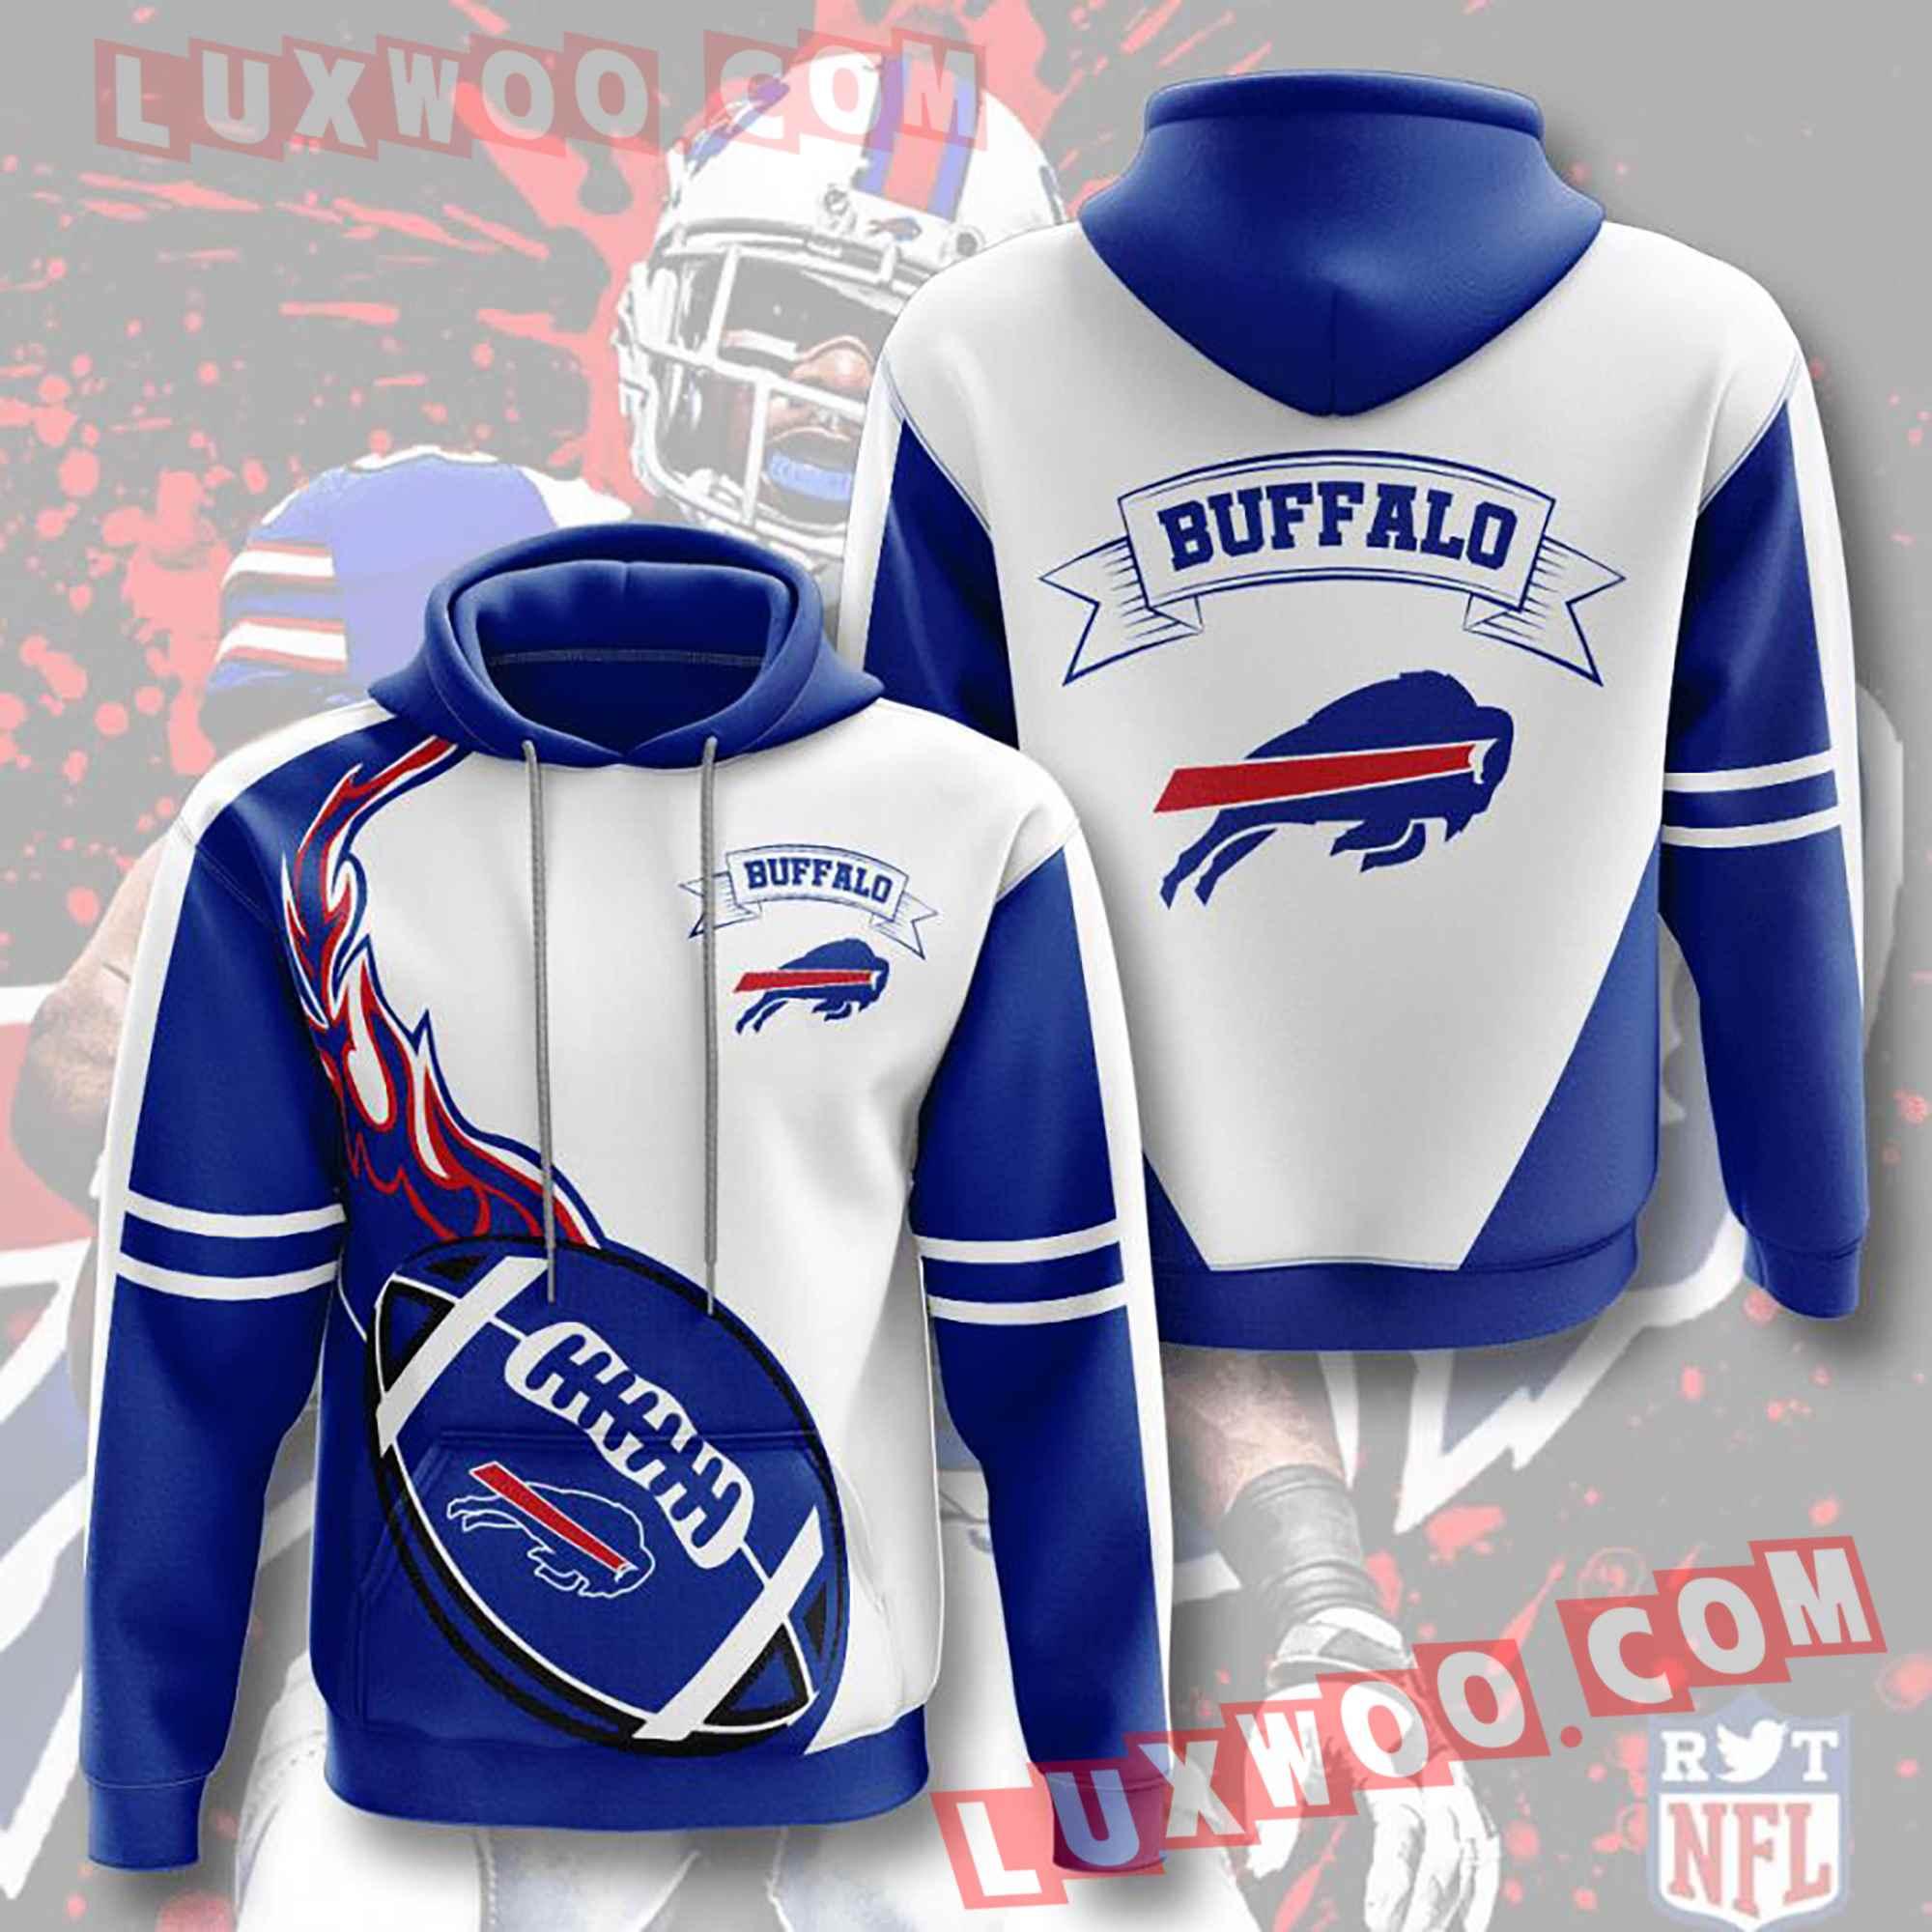 Nfl Buffalo Bills Hoodies Custom All Over Print 3d Pullover Hoodie V11